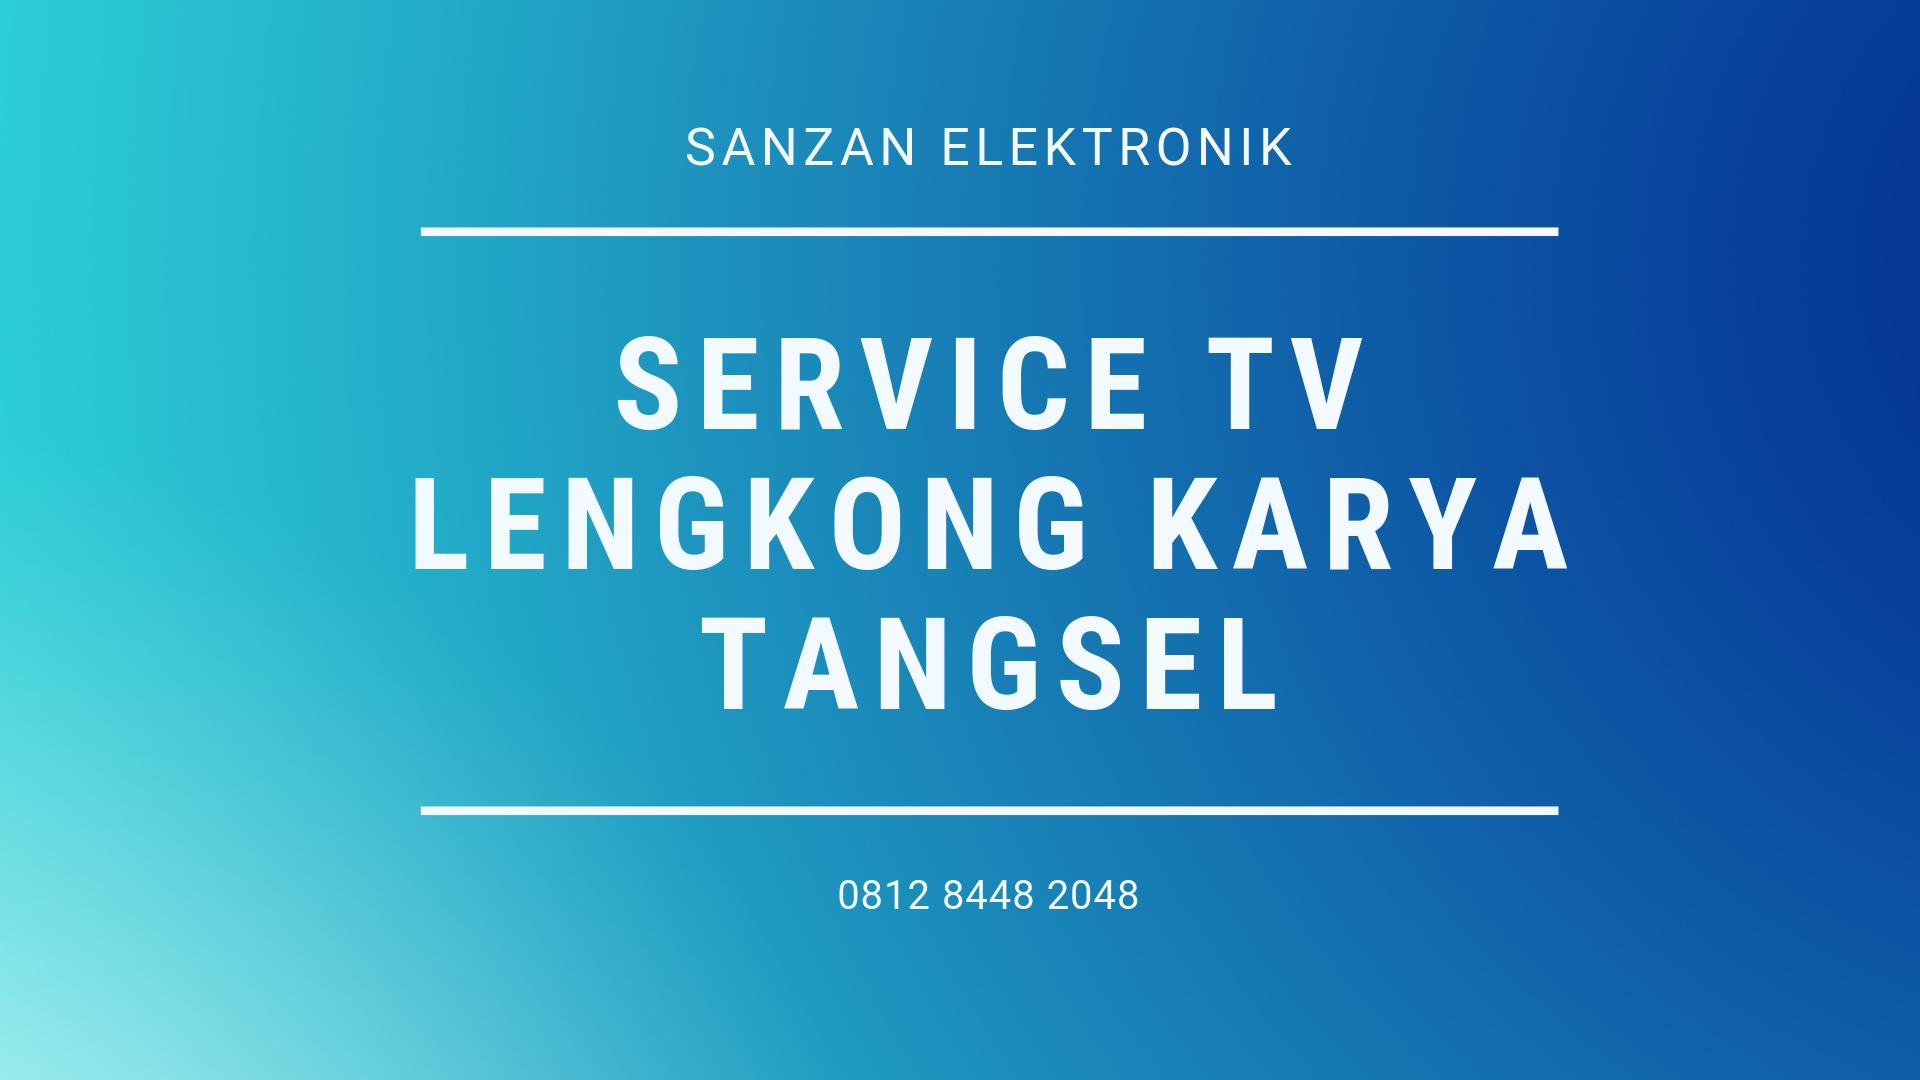 Service TV Lengkong Karya Tangsel